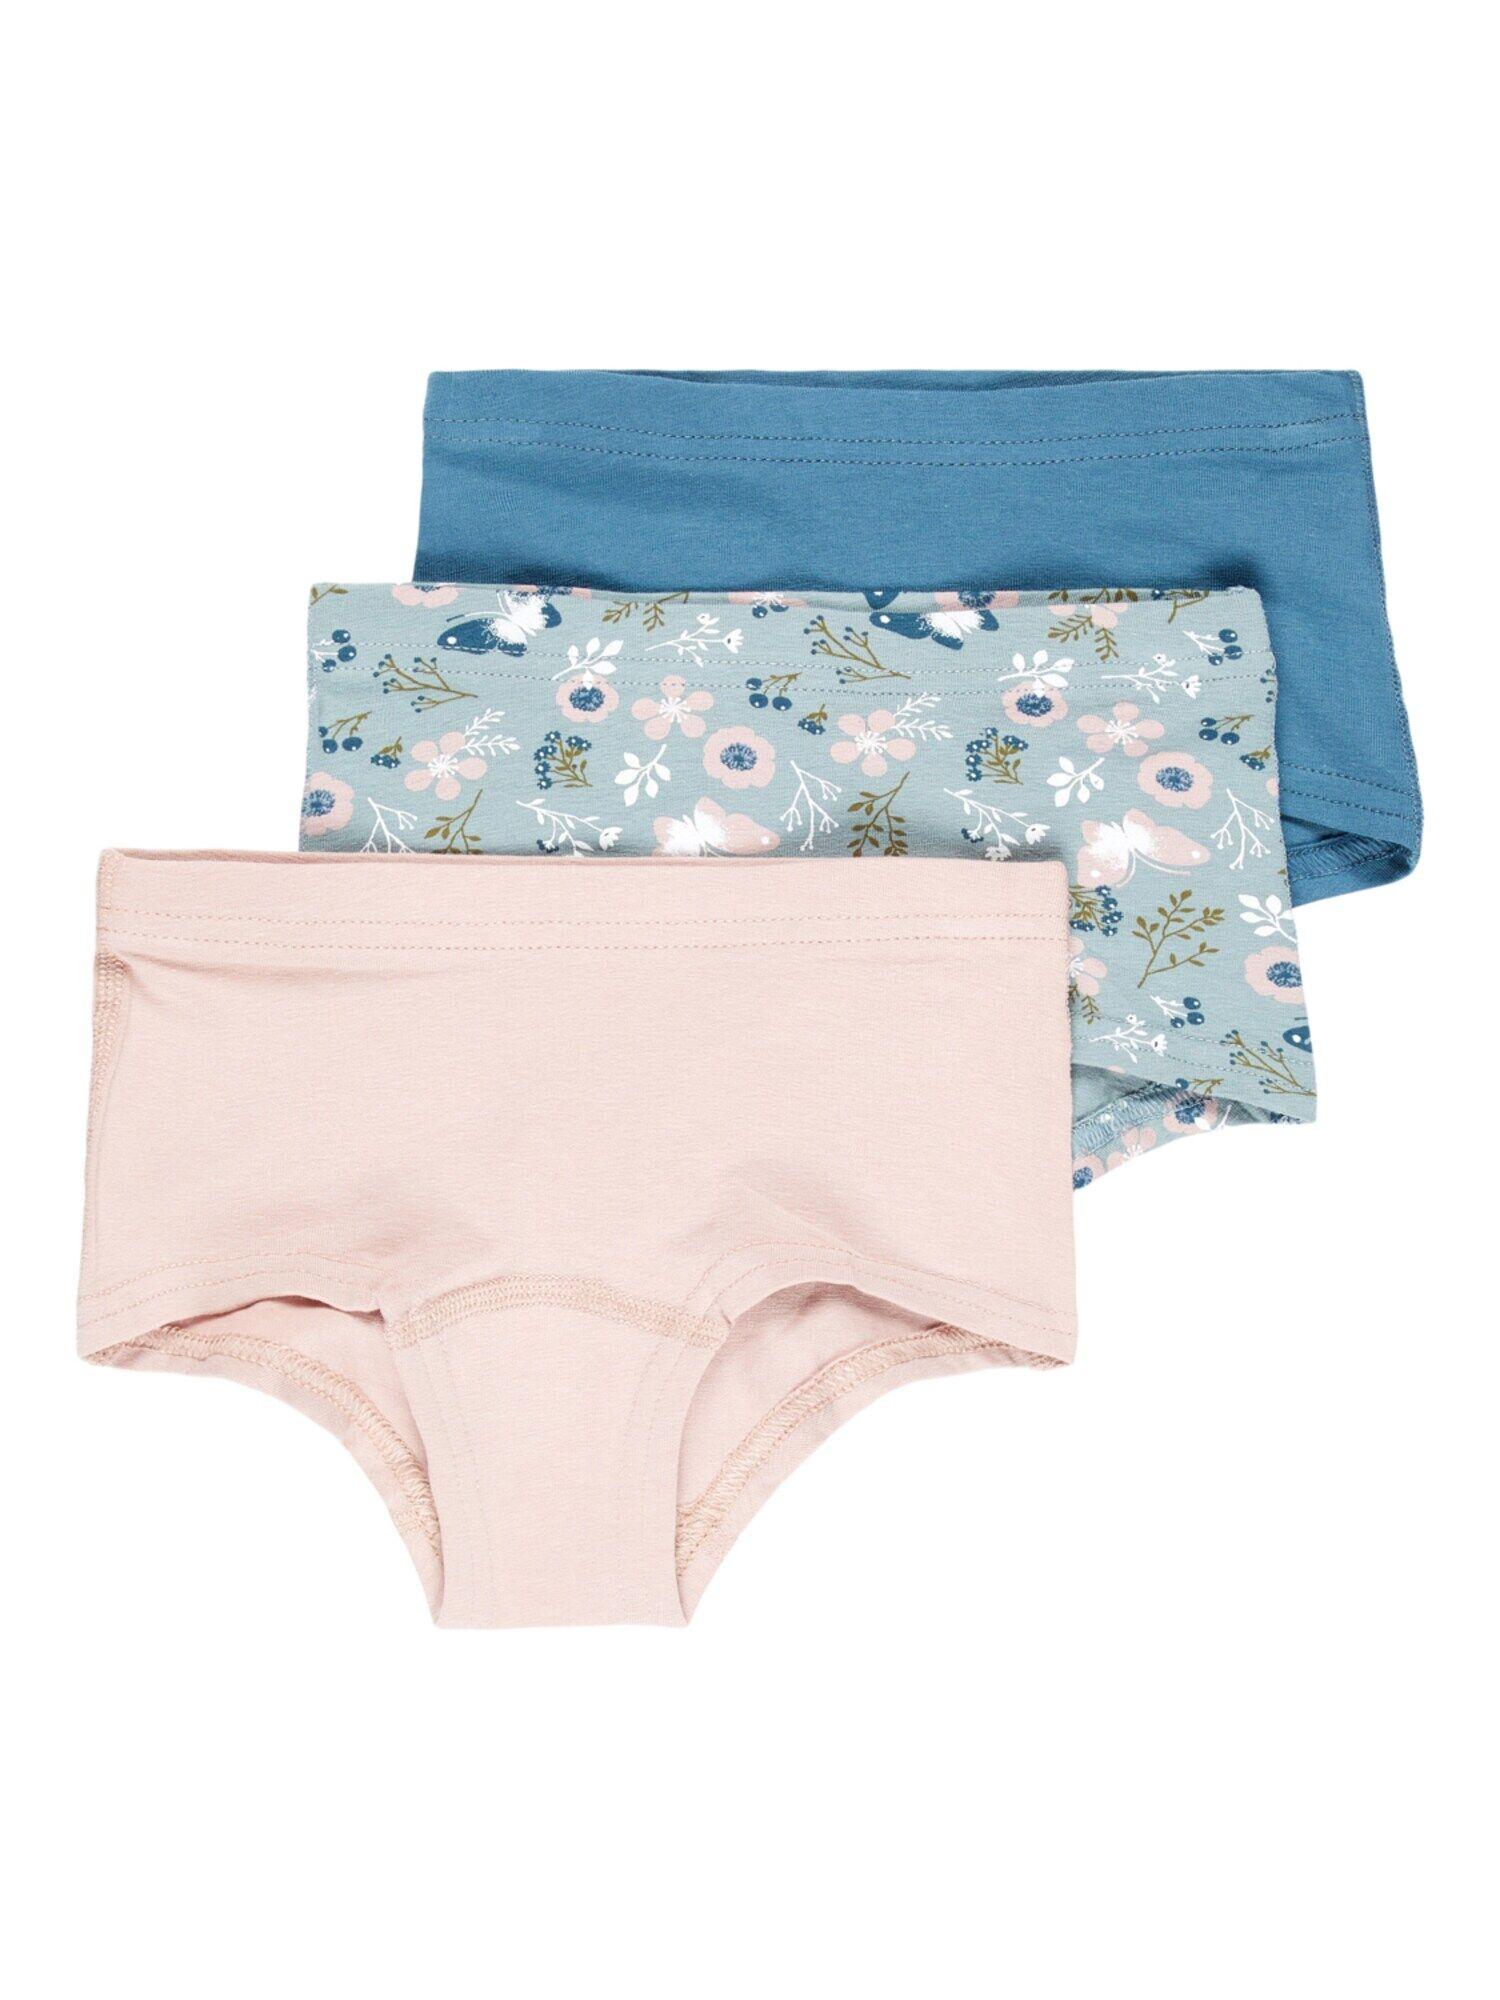 NAME IT Sous-vêtements  - Rose, Bleu - Taille: 98 - girl